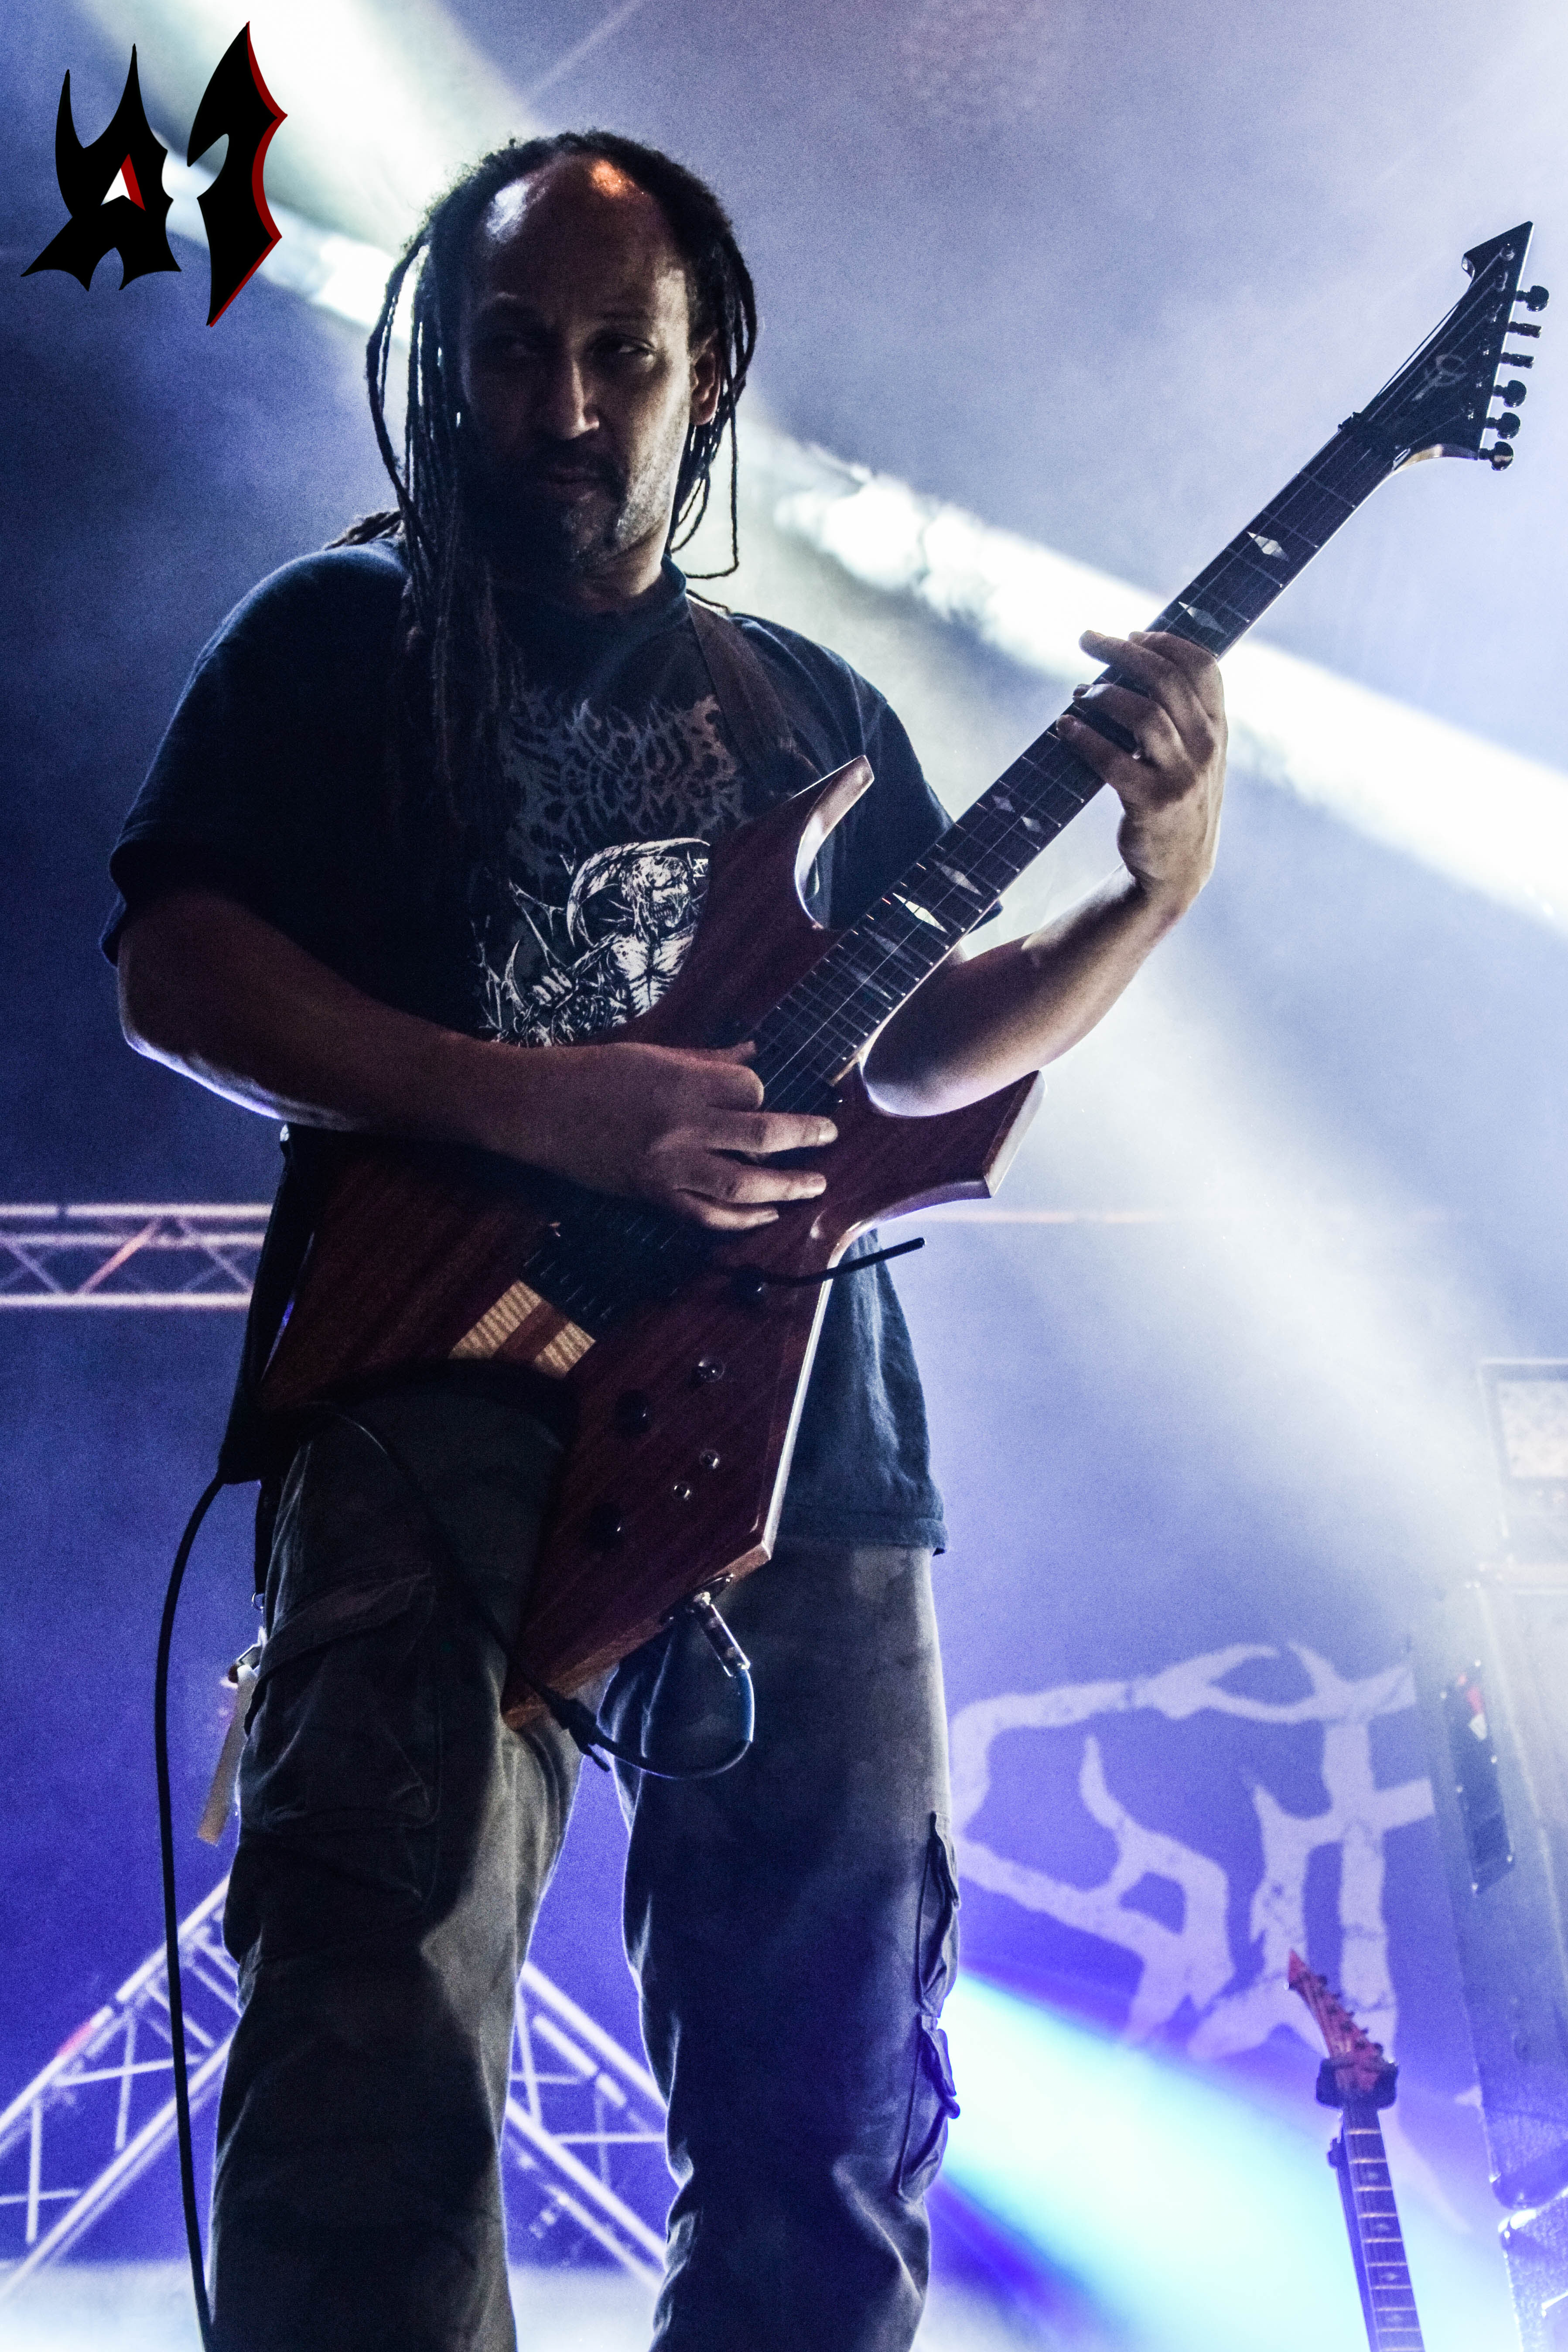 Hellfest - Day 1 - Suffocation 3